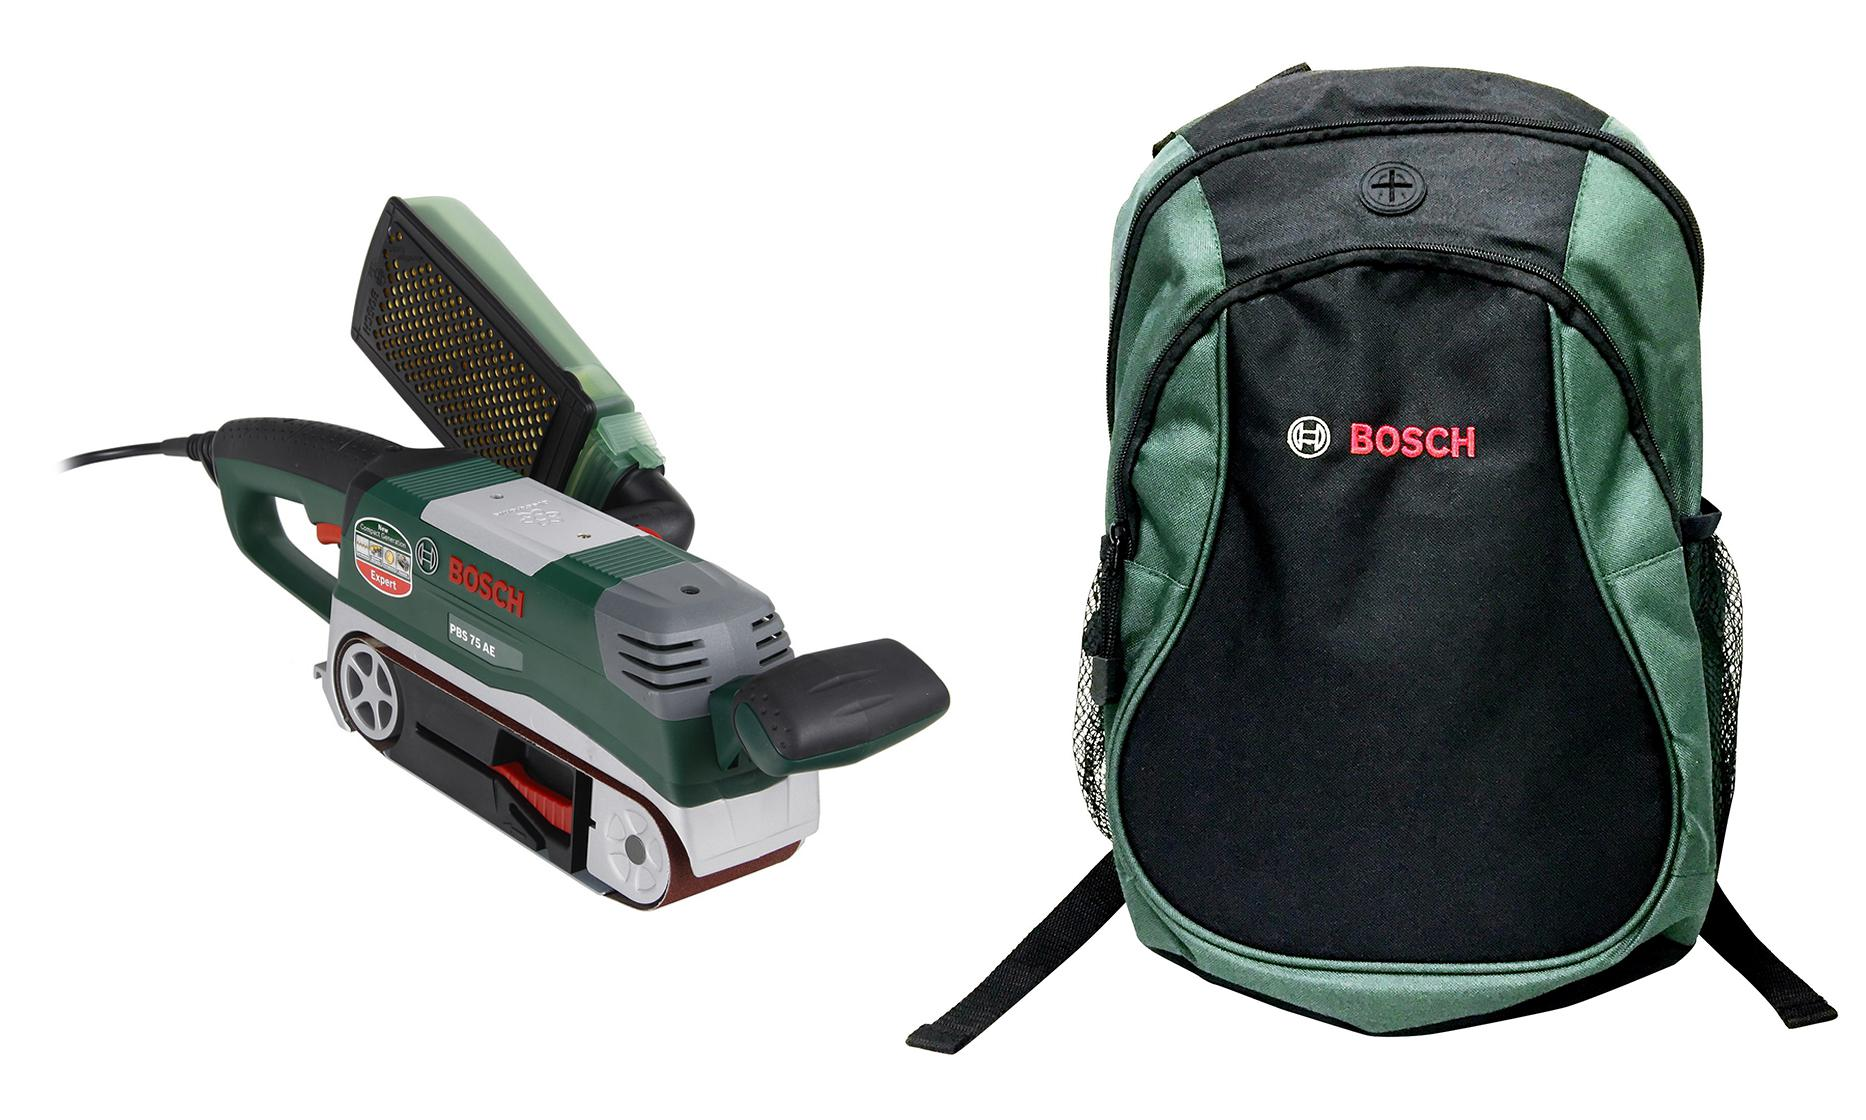 Набор Bosch Шлиф.машинка ленточная pbs 75 ae (06032a1120) + рюкзак green (1619g45200)